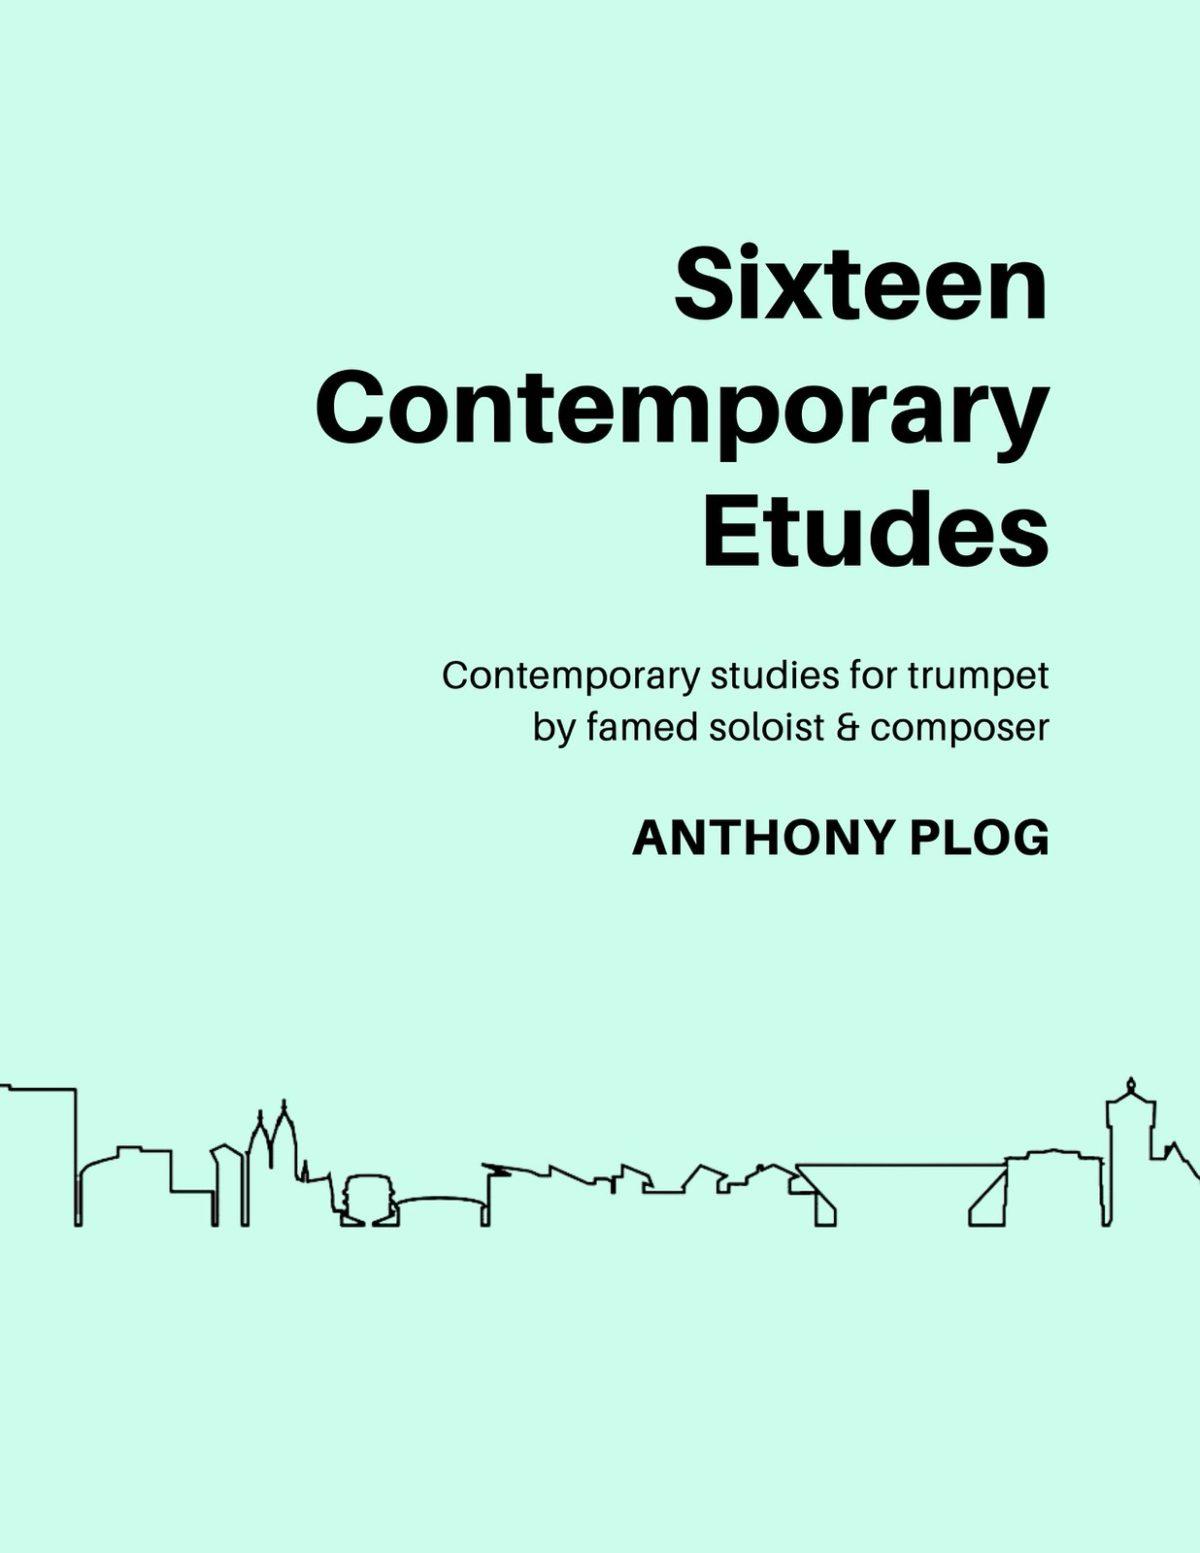 Plog, 16 Contemporary Etudes for Trumpet-p01